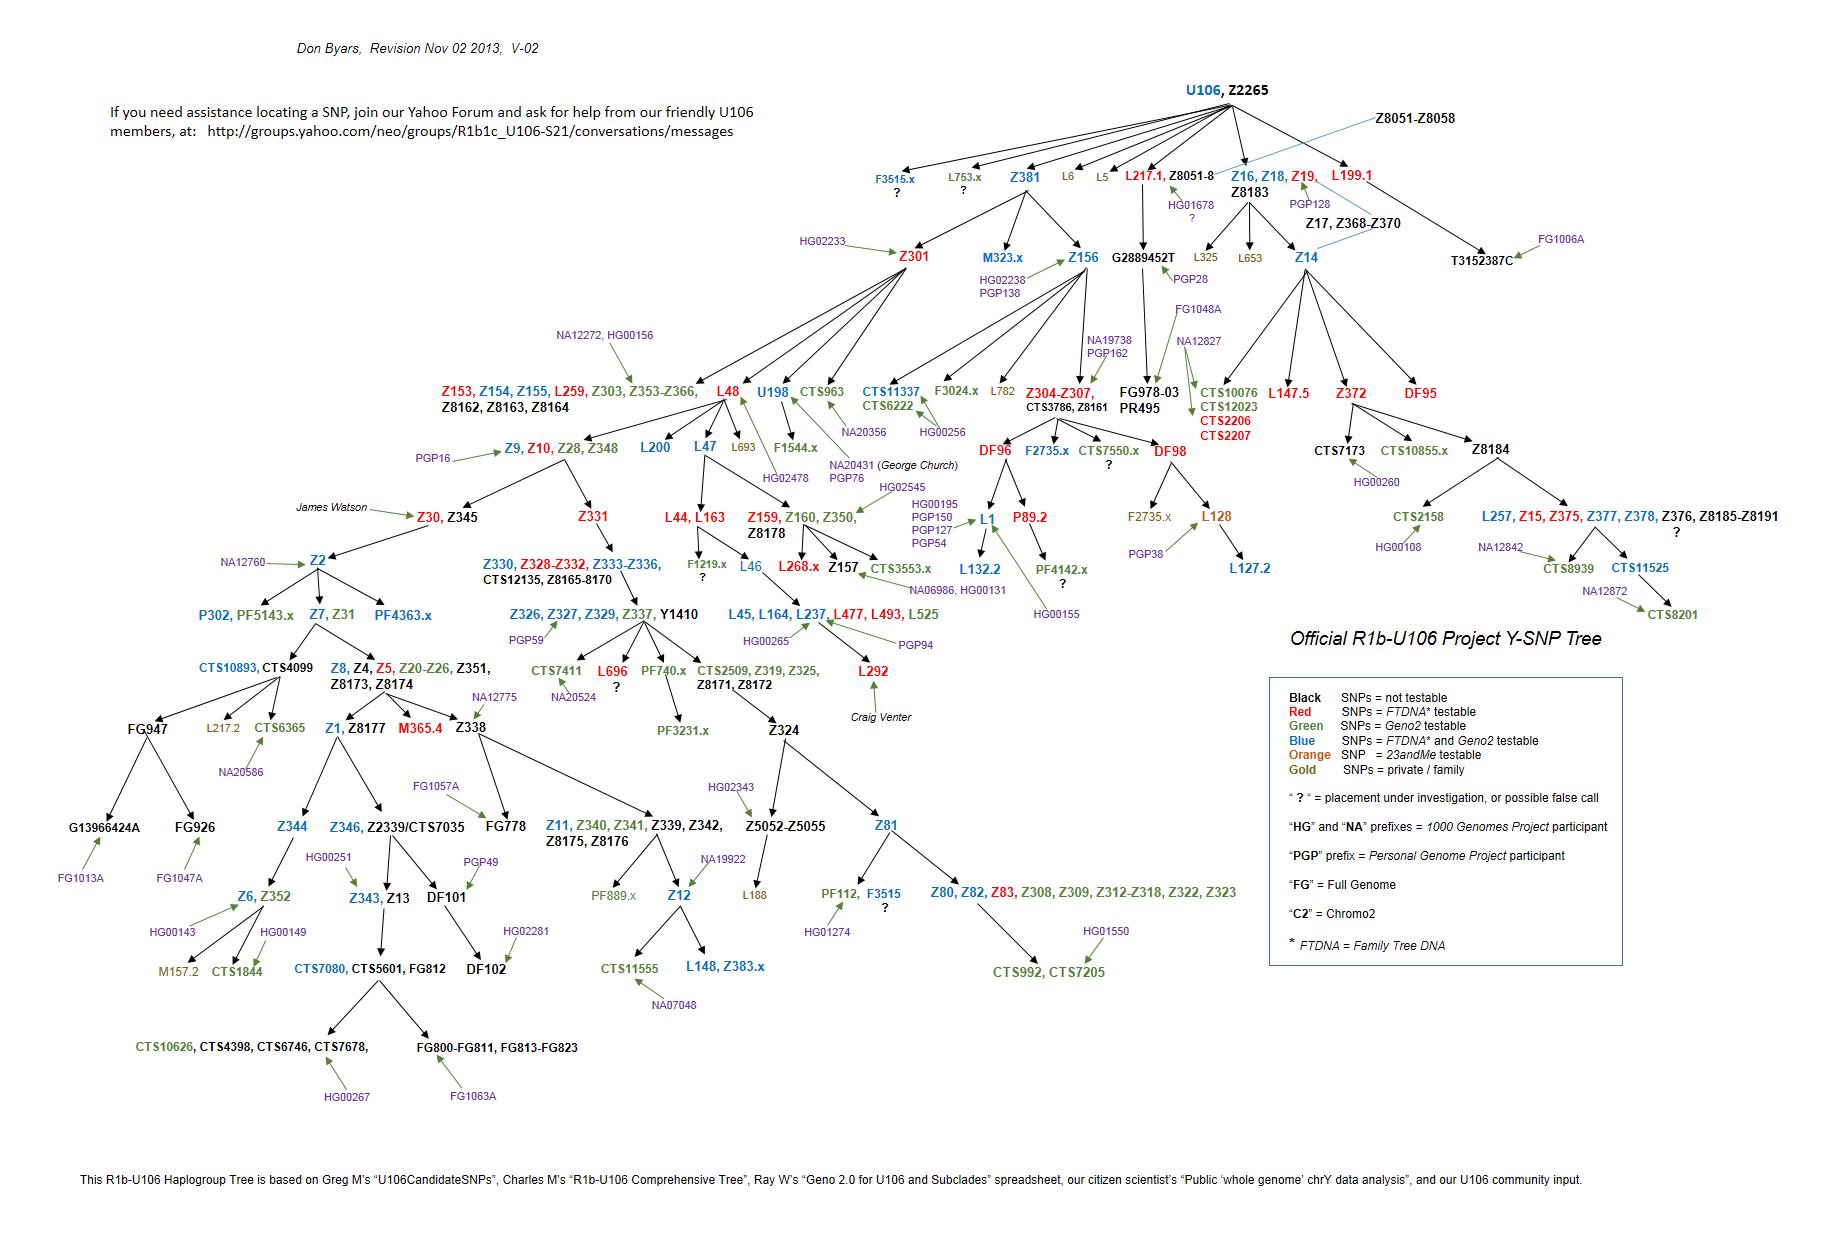 R1b-U106 Project Y-SNP Tree, V-02 C